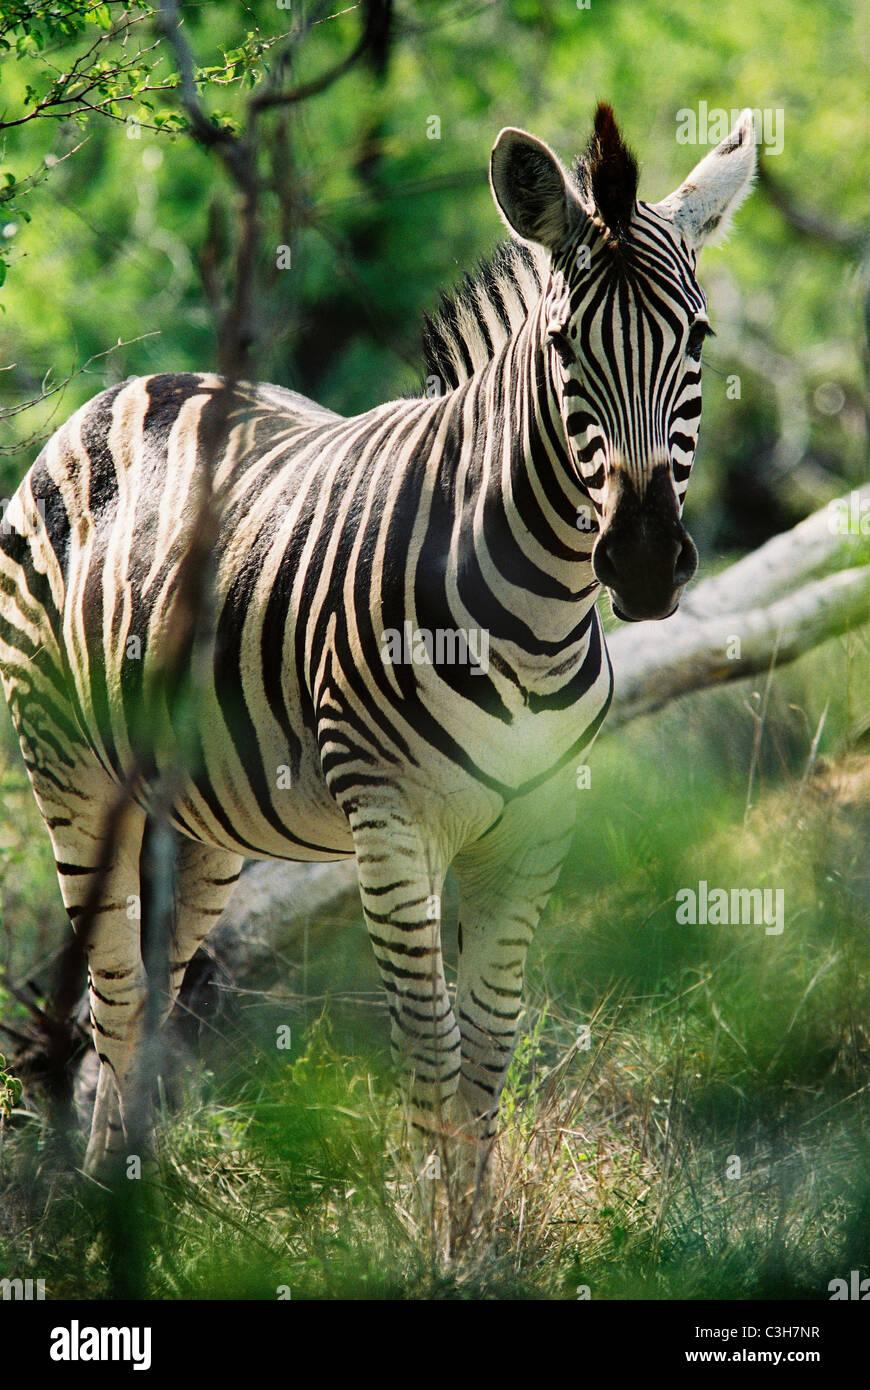 Zebra Burchell's zebra (Equus burchellii) Mala mala Sud Africa Immagini Stock